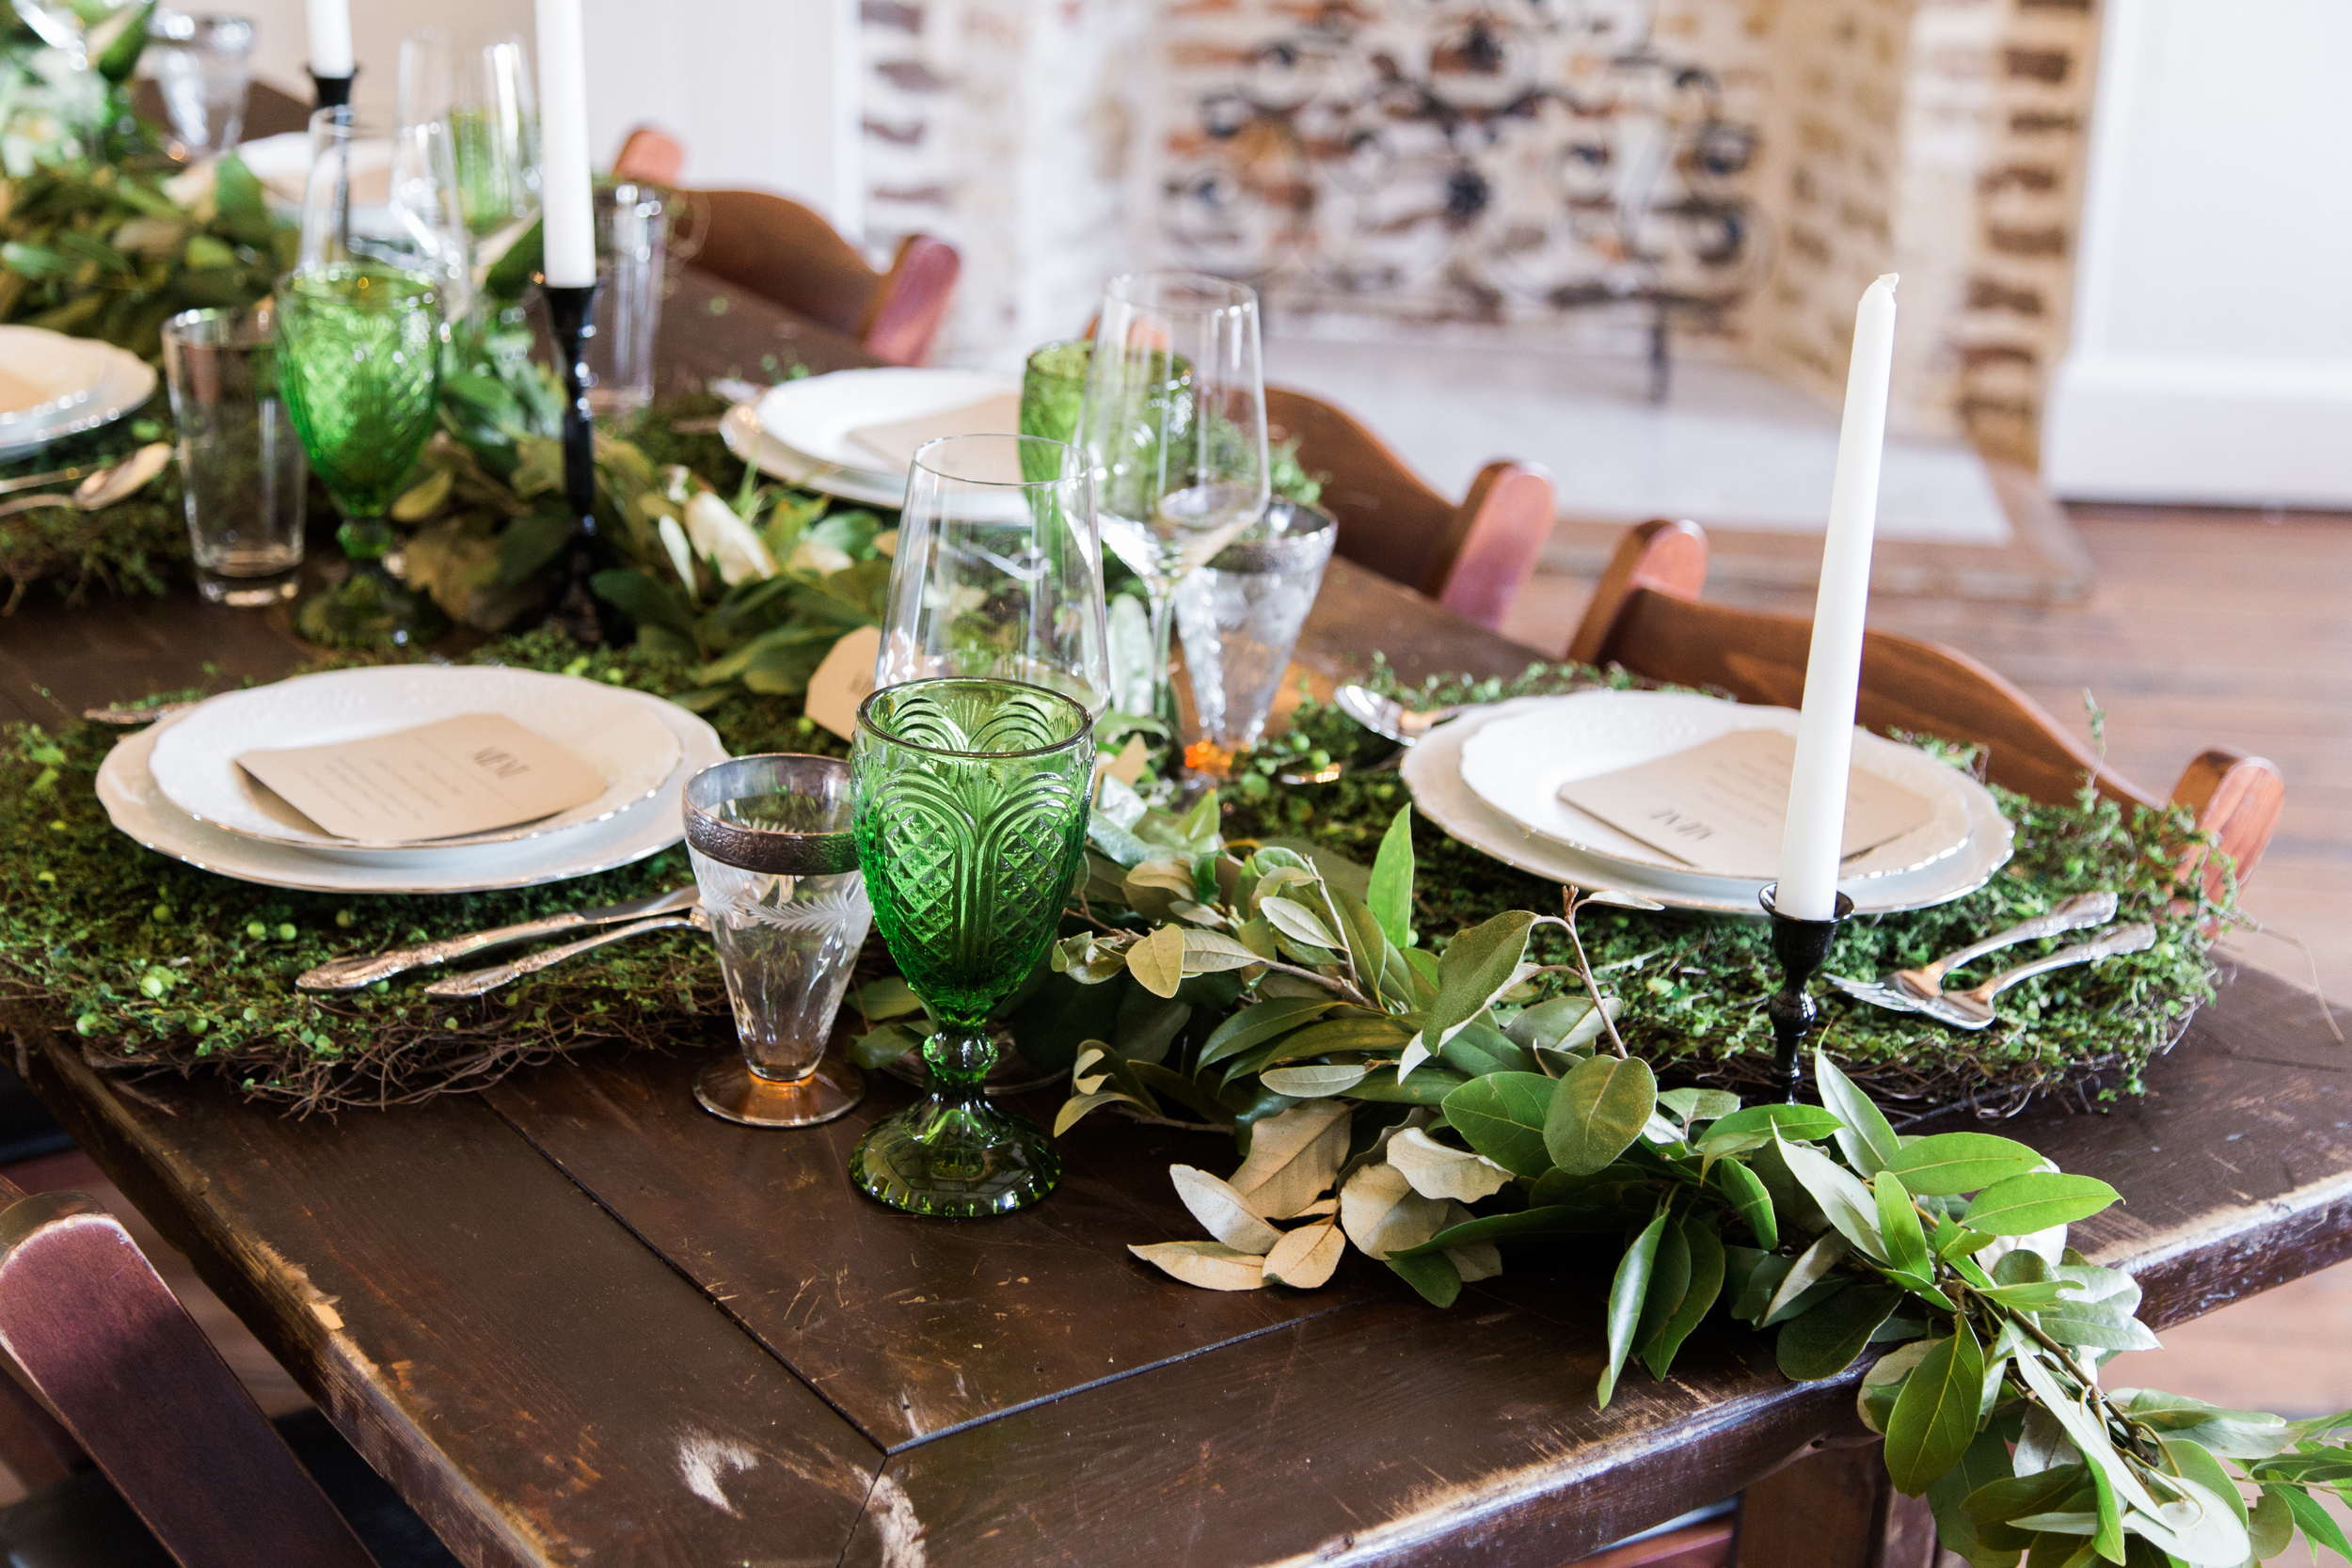 Foraged Fairytale Wedding at Upstairs at Midtown on the Scarlet Wedding Tour Charleston, SC